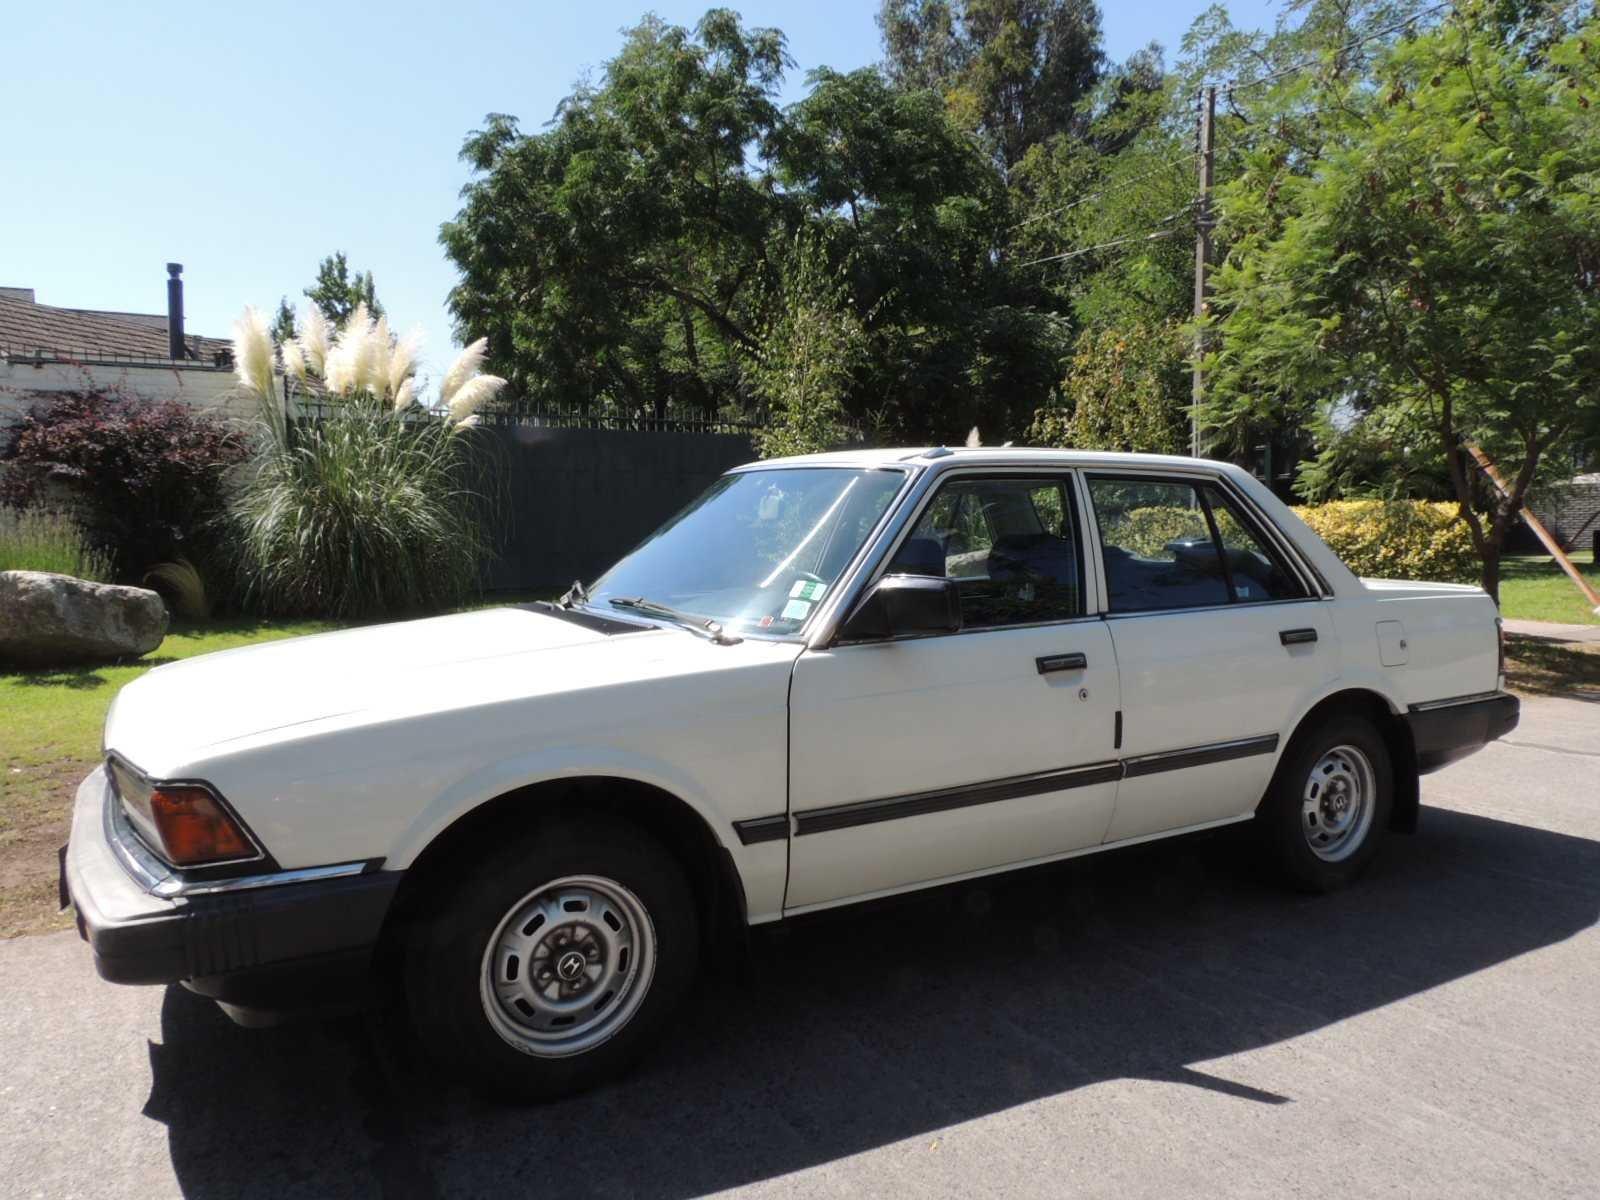 Honda Accord 1.6 EX Hondamatic 1983 Rutamotor Clásicos (21)